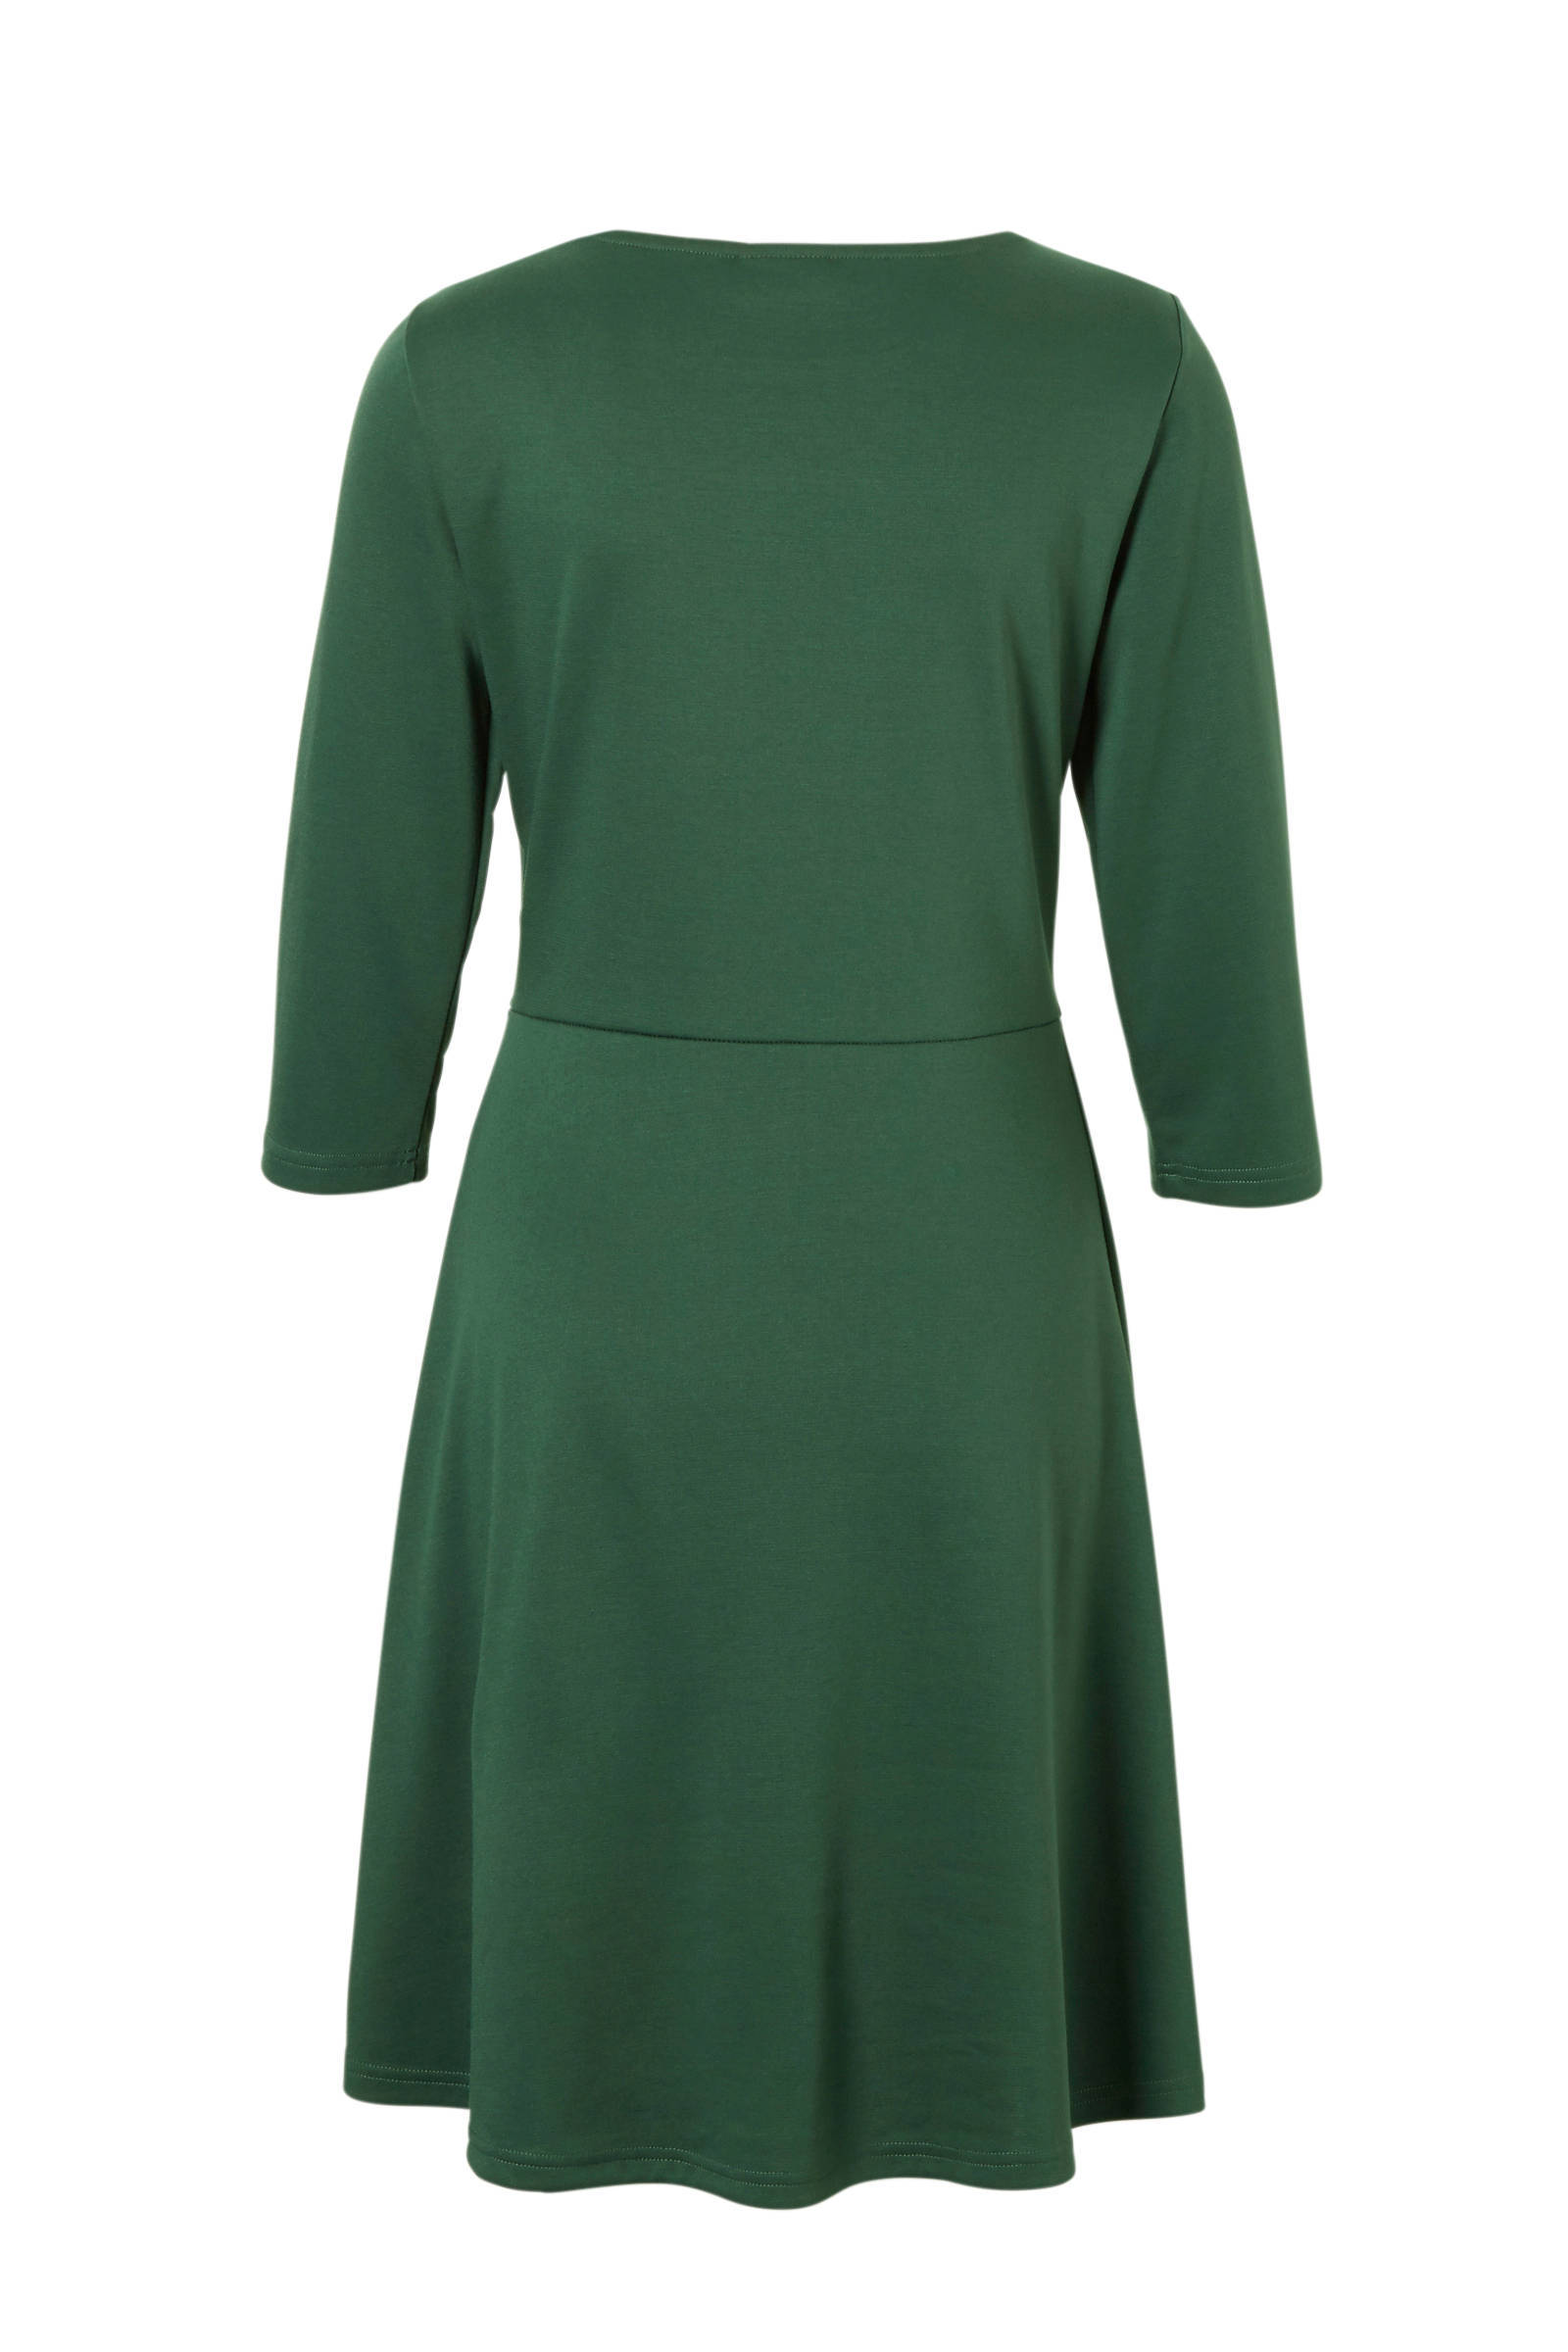 jurk VILA VILA jurk plooien met wExqRppz